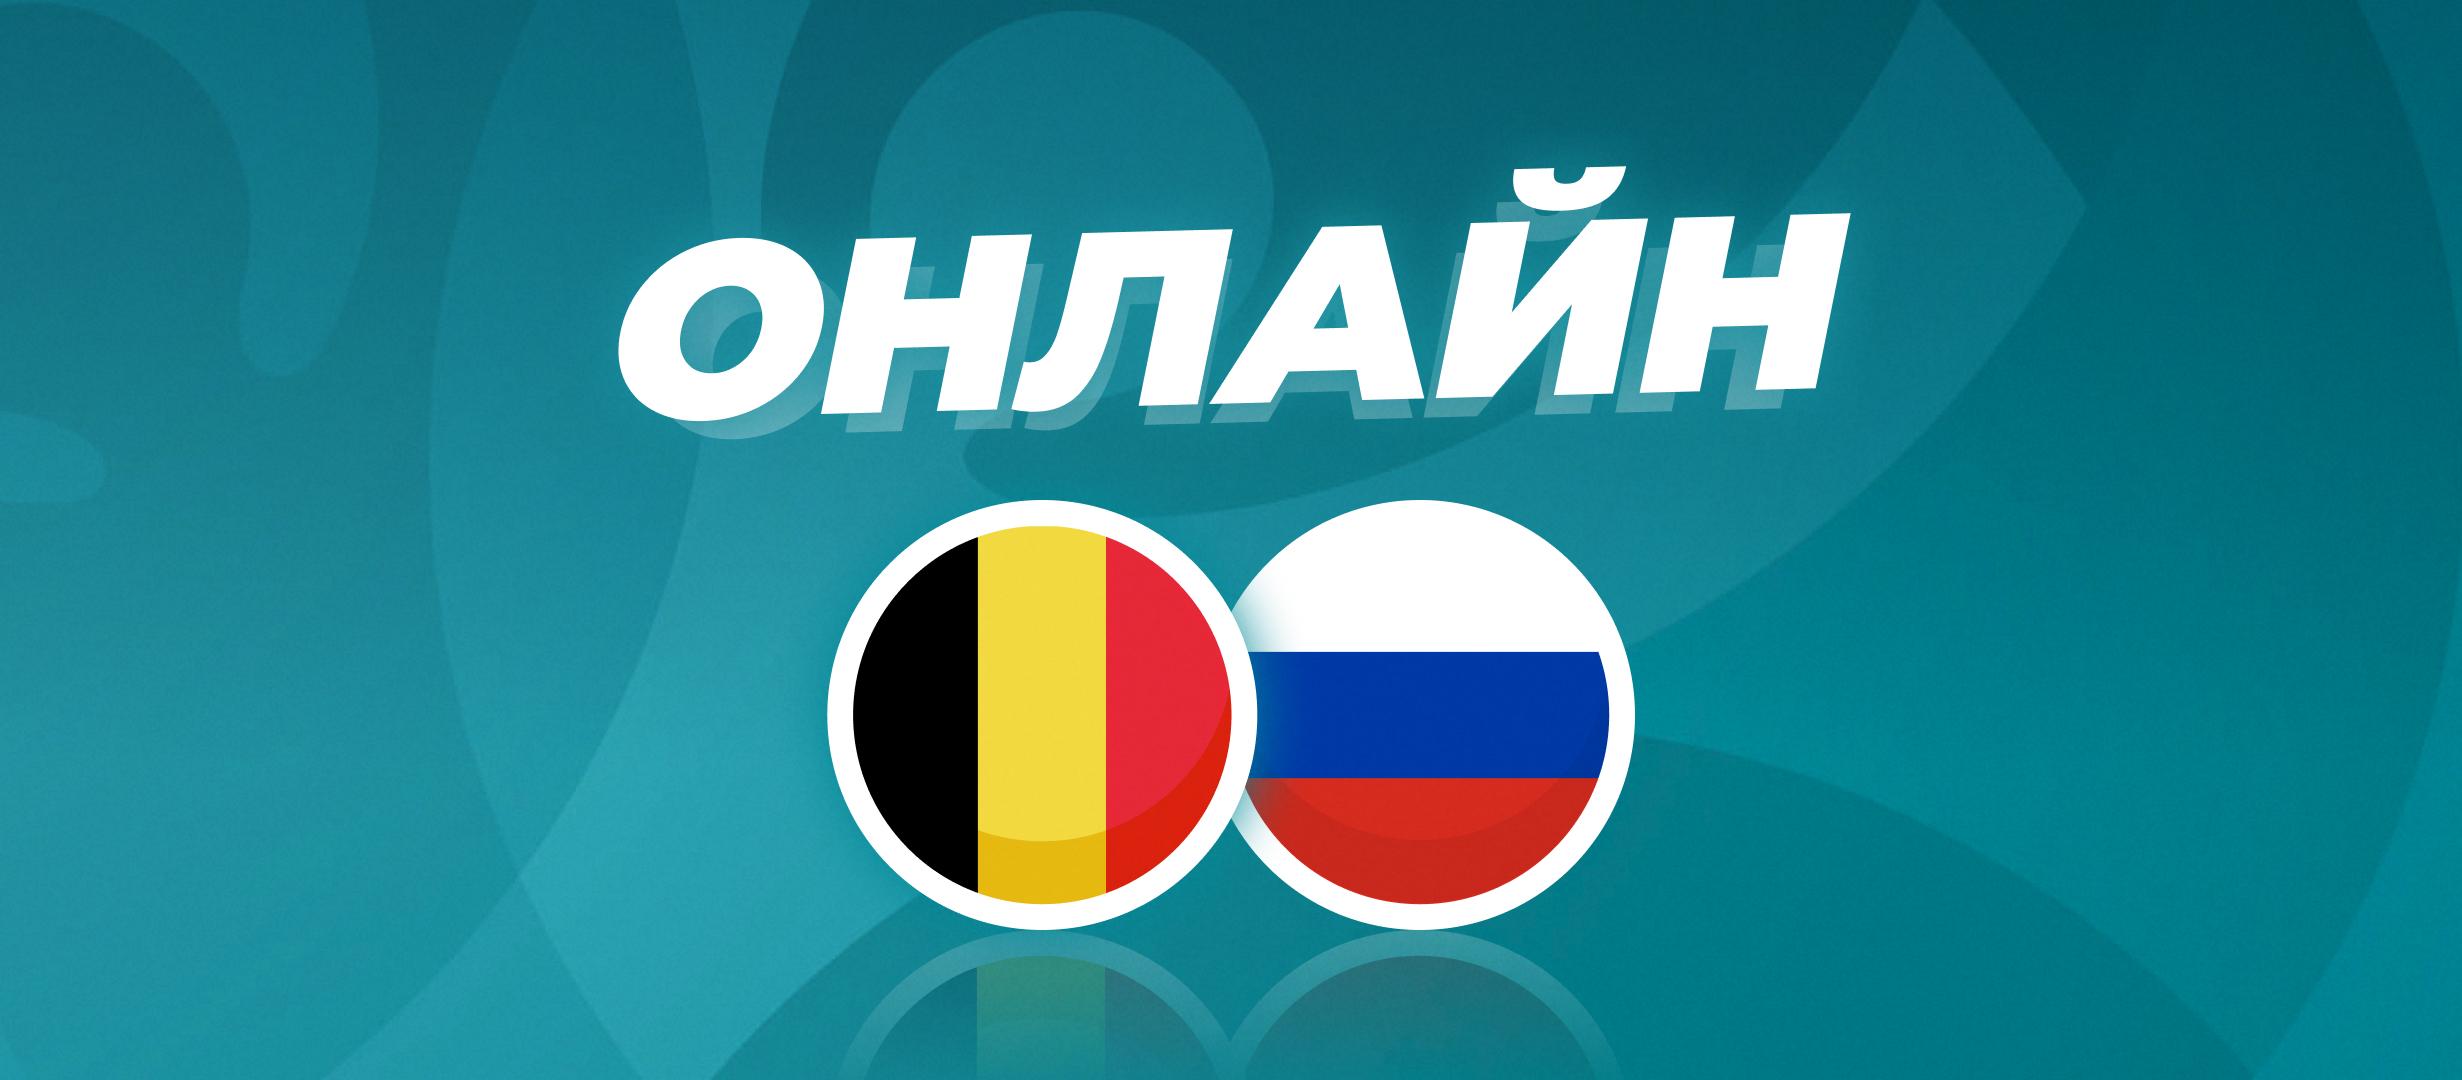 Бельгия - Россия на ЕВРО-2020: онлайн трансляция